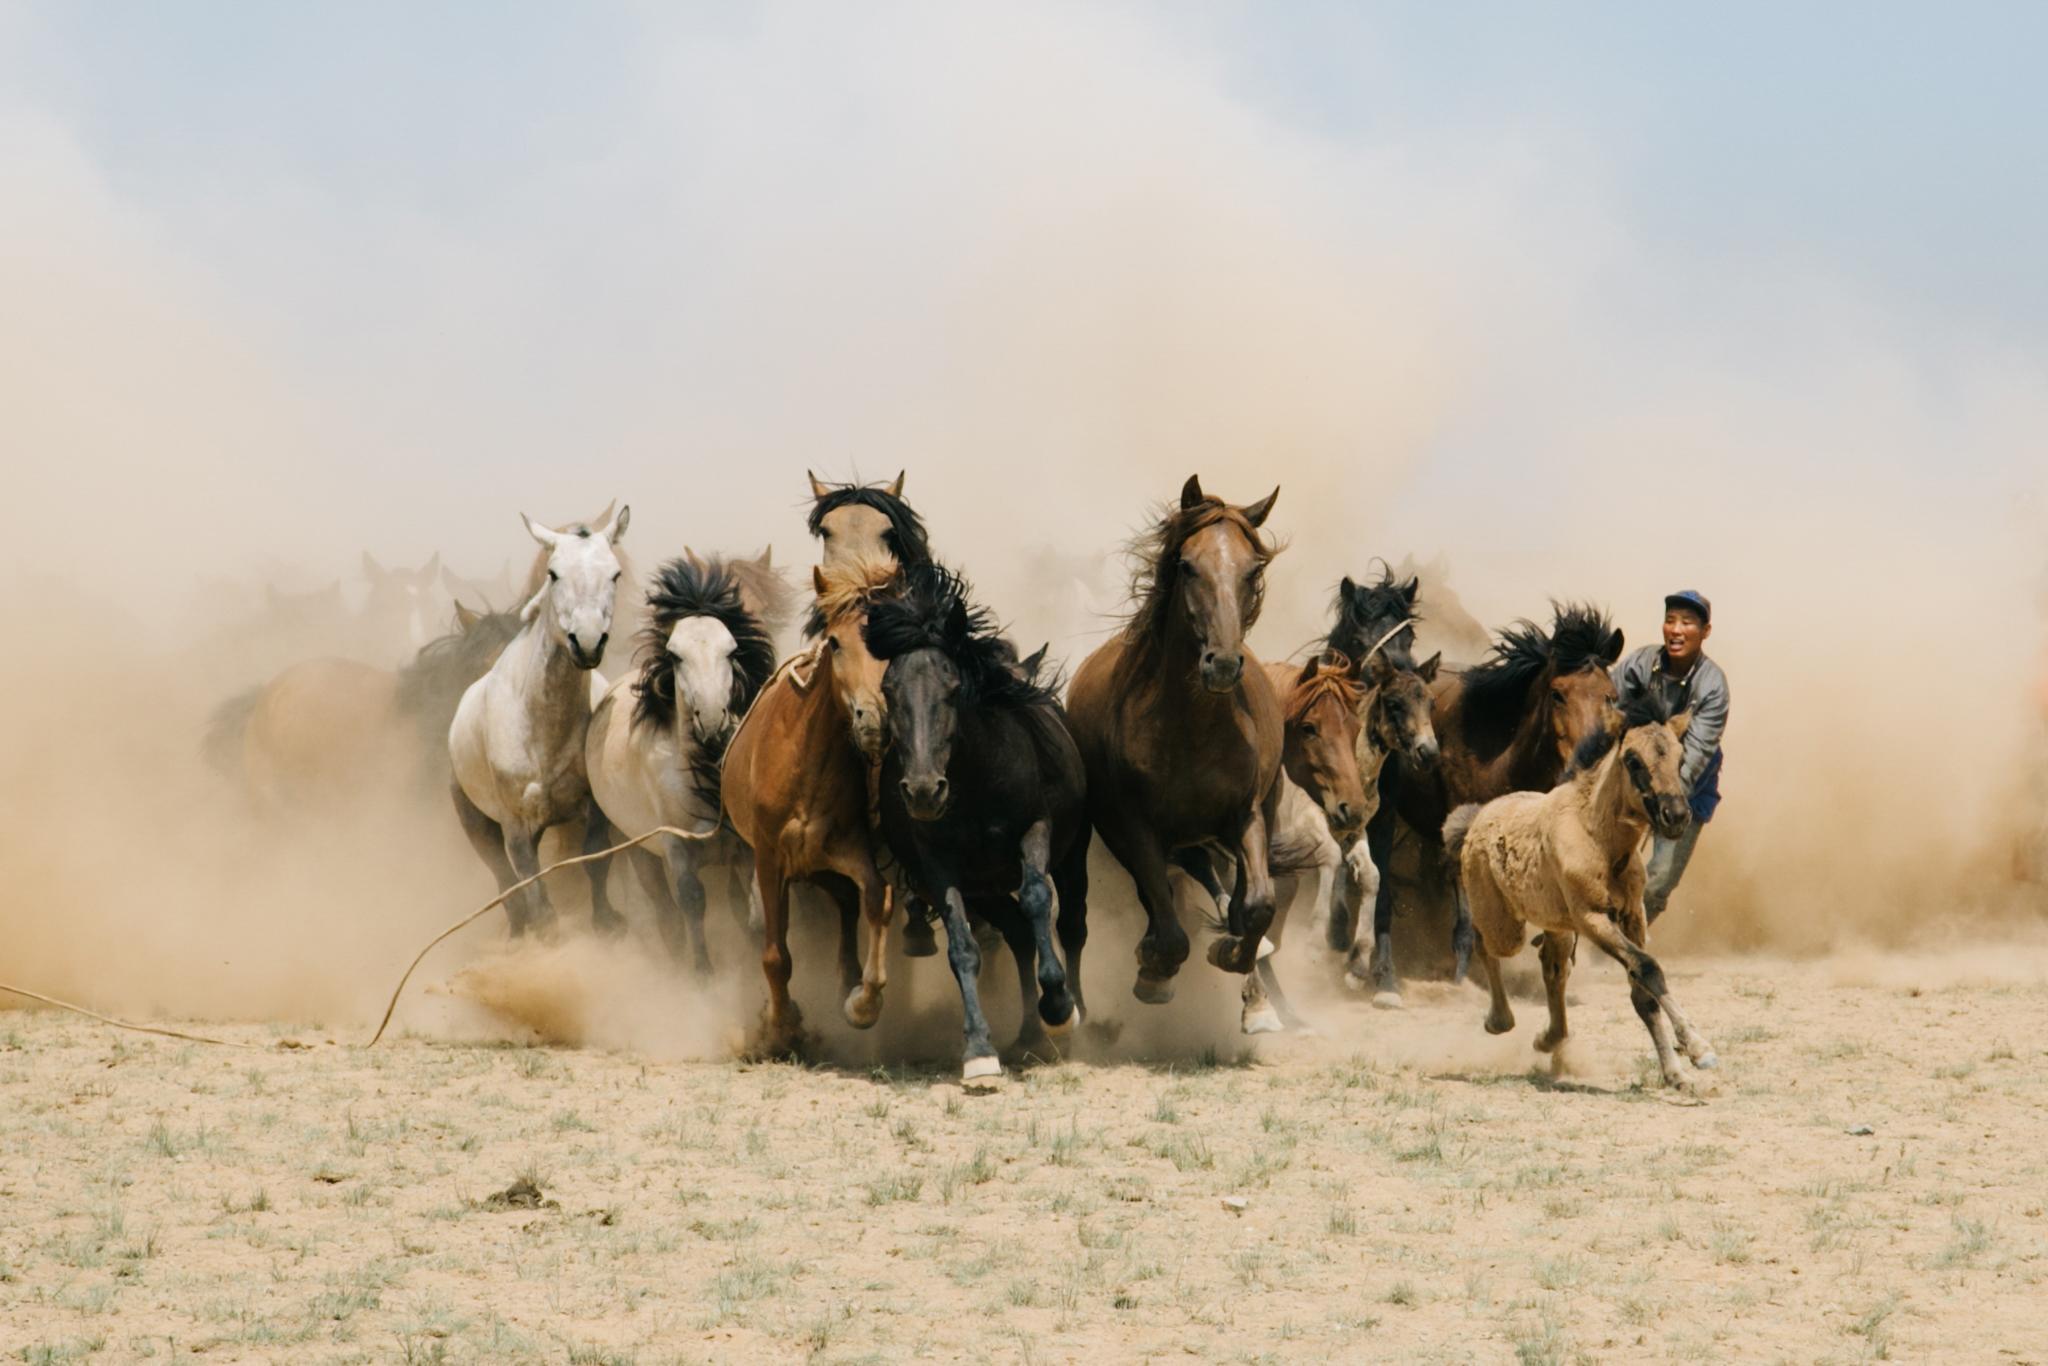 ellamackphotos_website_landscapes_mongolia_horses.jpg